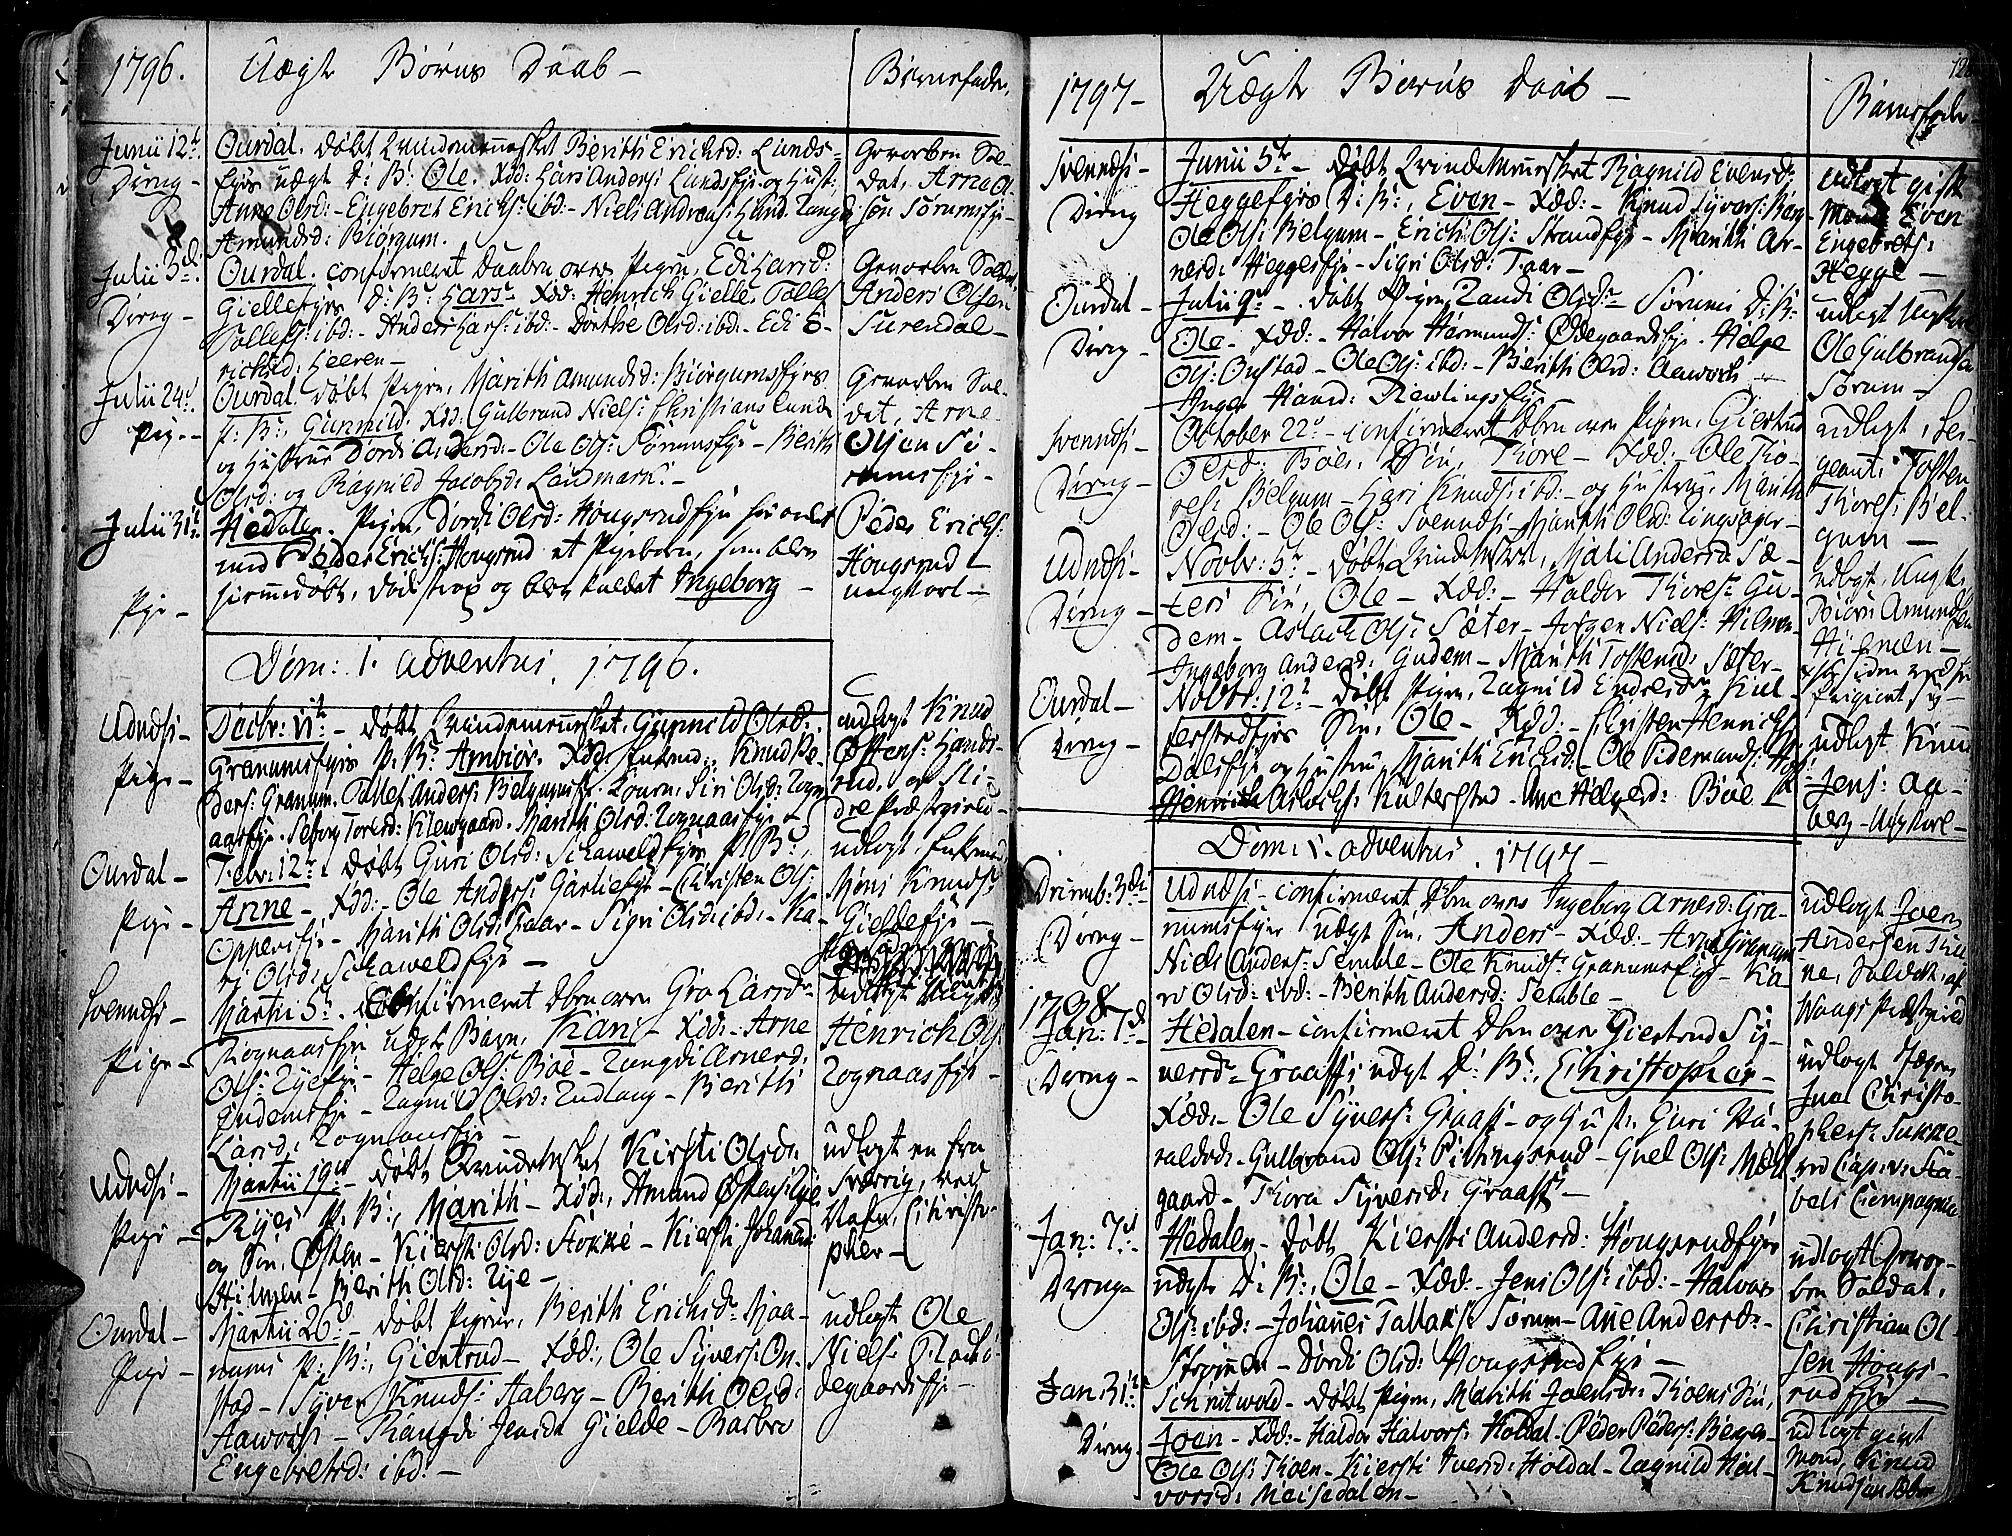 SAH, Aurdal prestekontor, Ministerialbok nr. 6, 1781-1804, s. 128